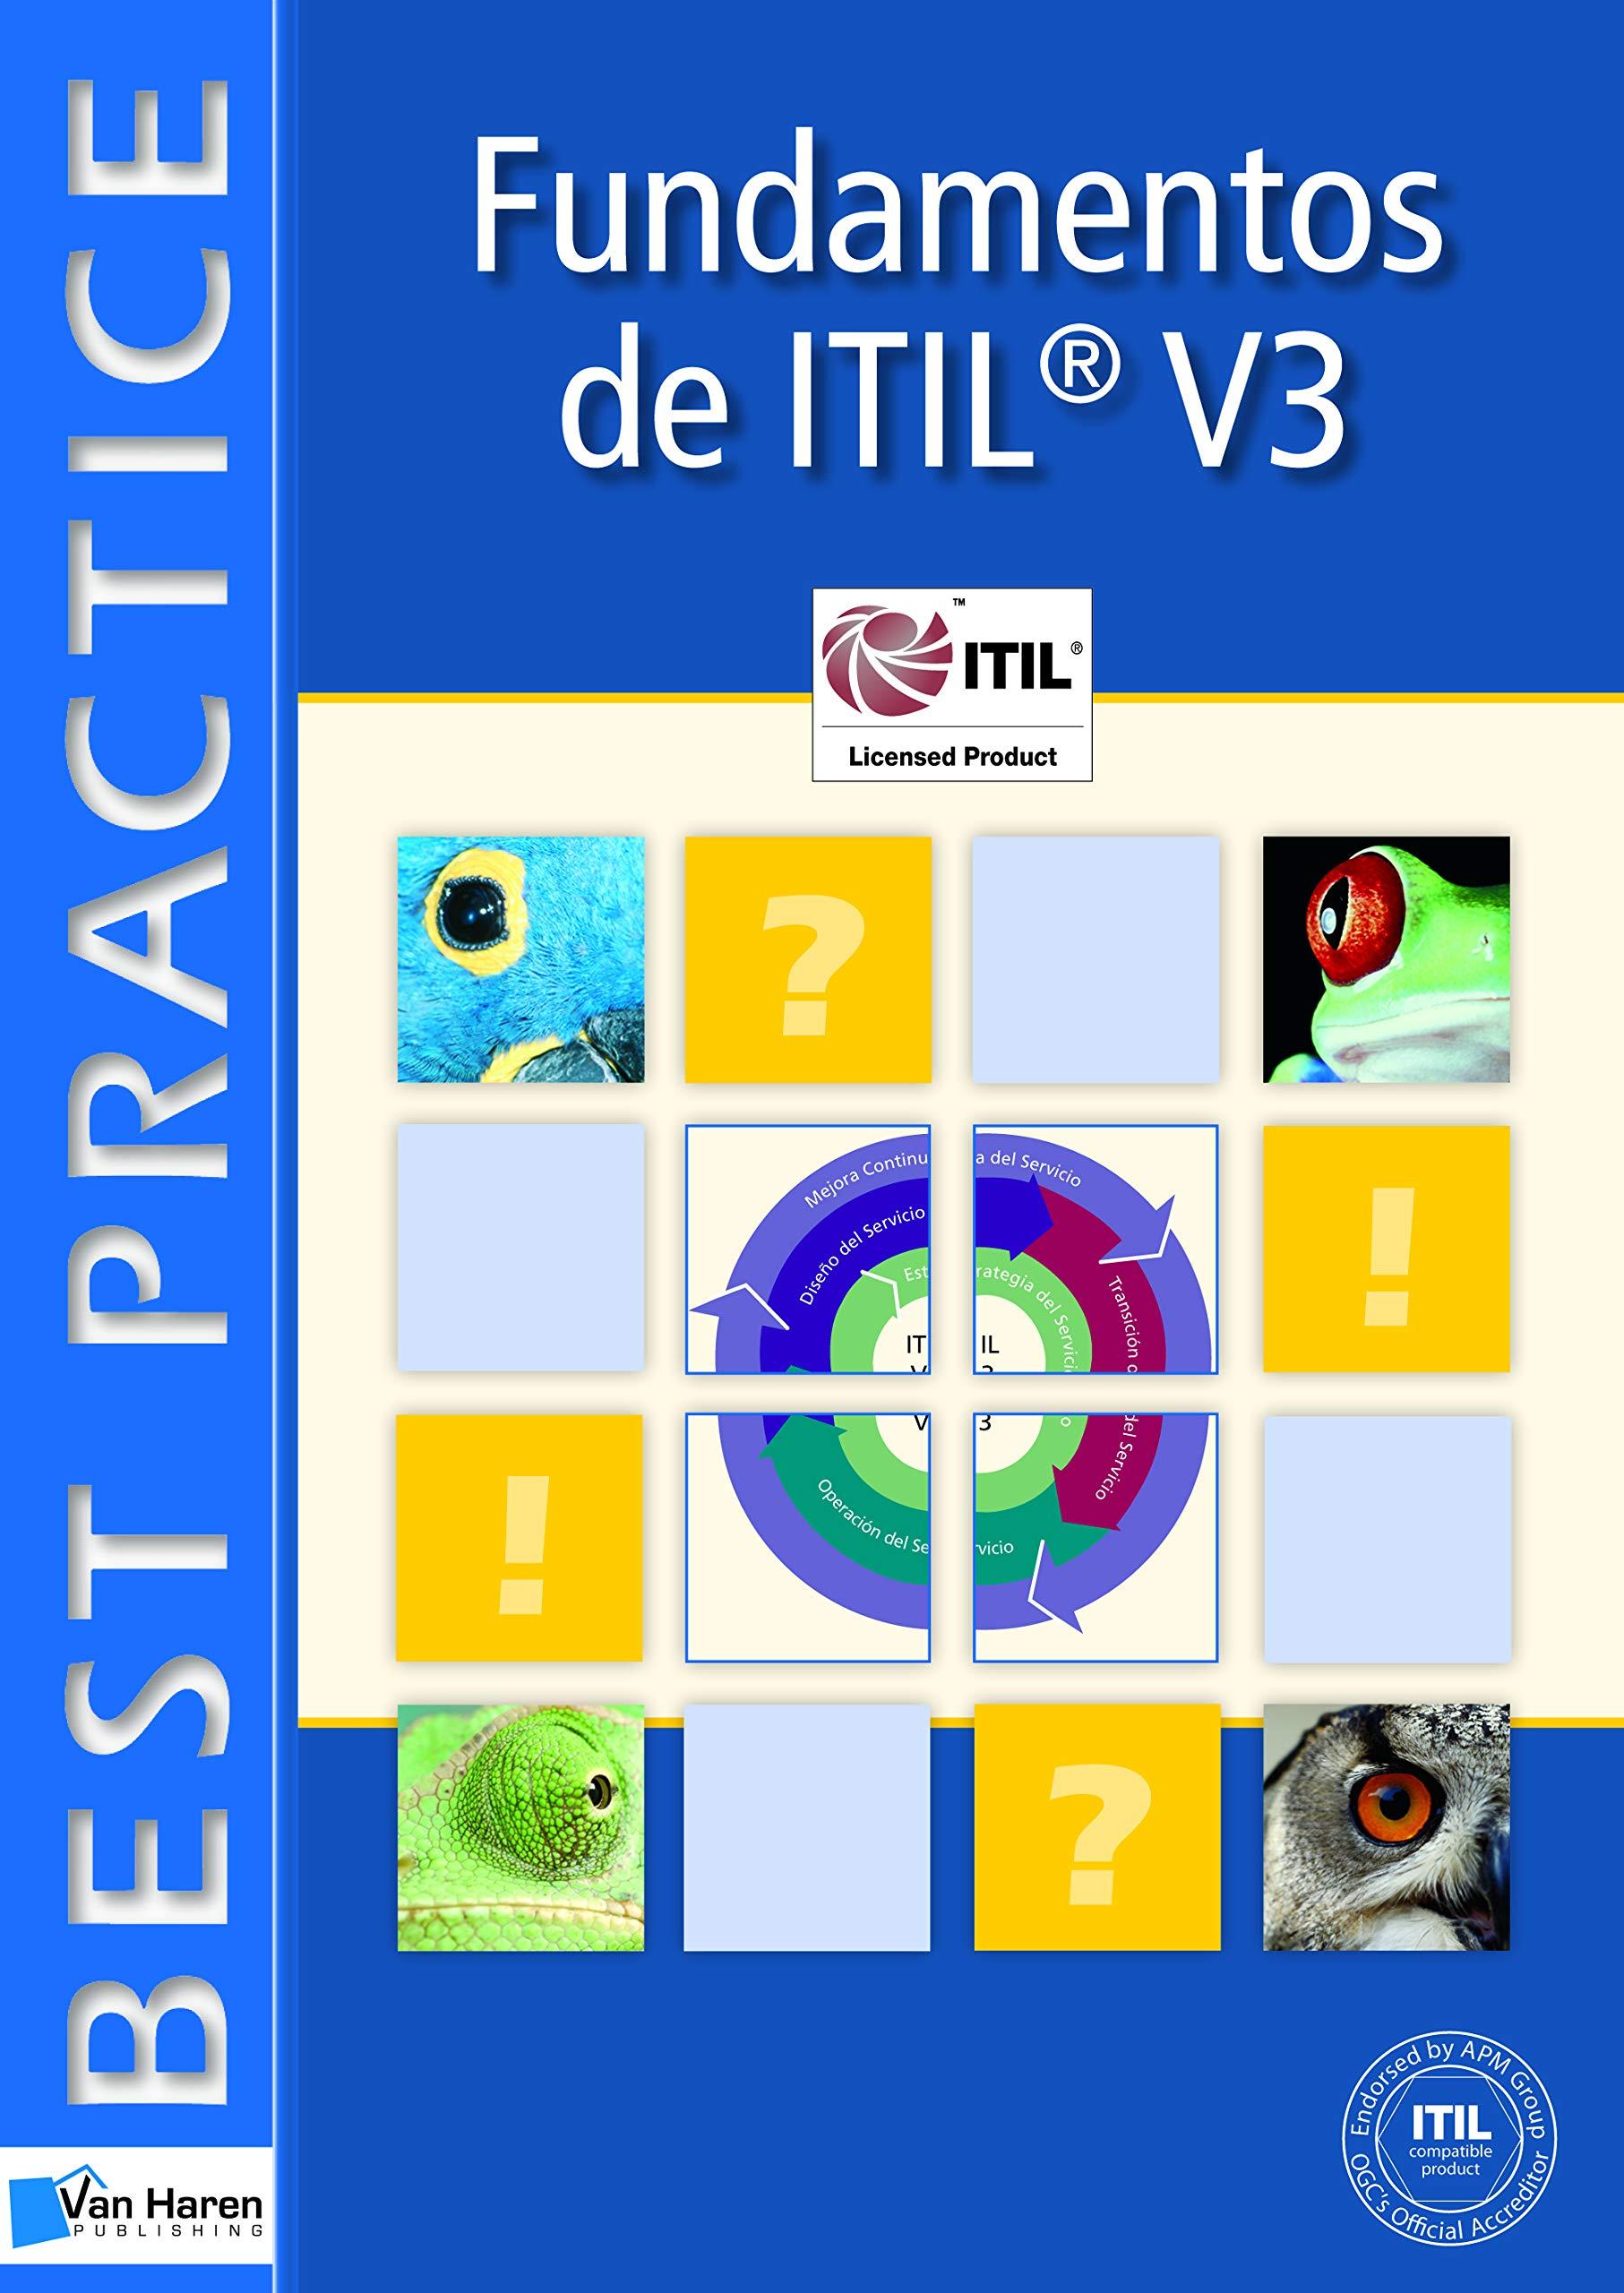 Foundations of IT Service Management Based on ITIL: Volume 3 (Best Practice Series) Tapa blanda Jan Van Bon Arjen de Jong Axel Kolthof Mike Pieper